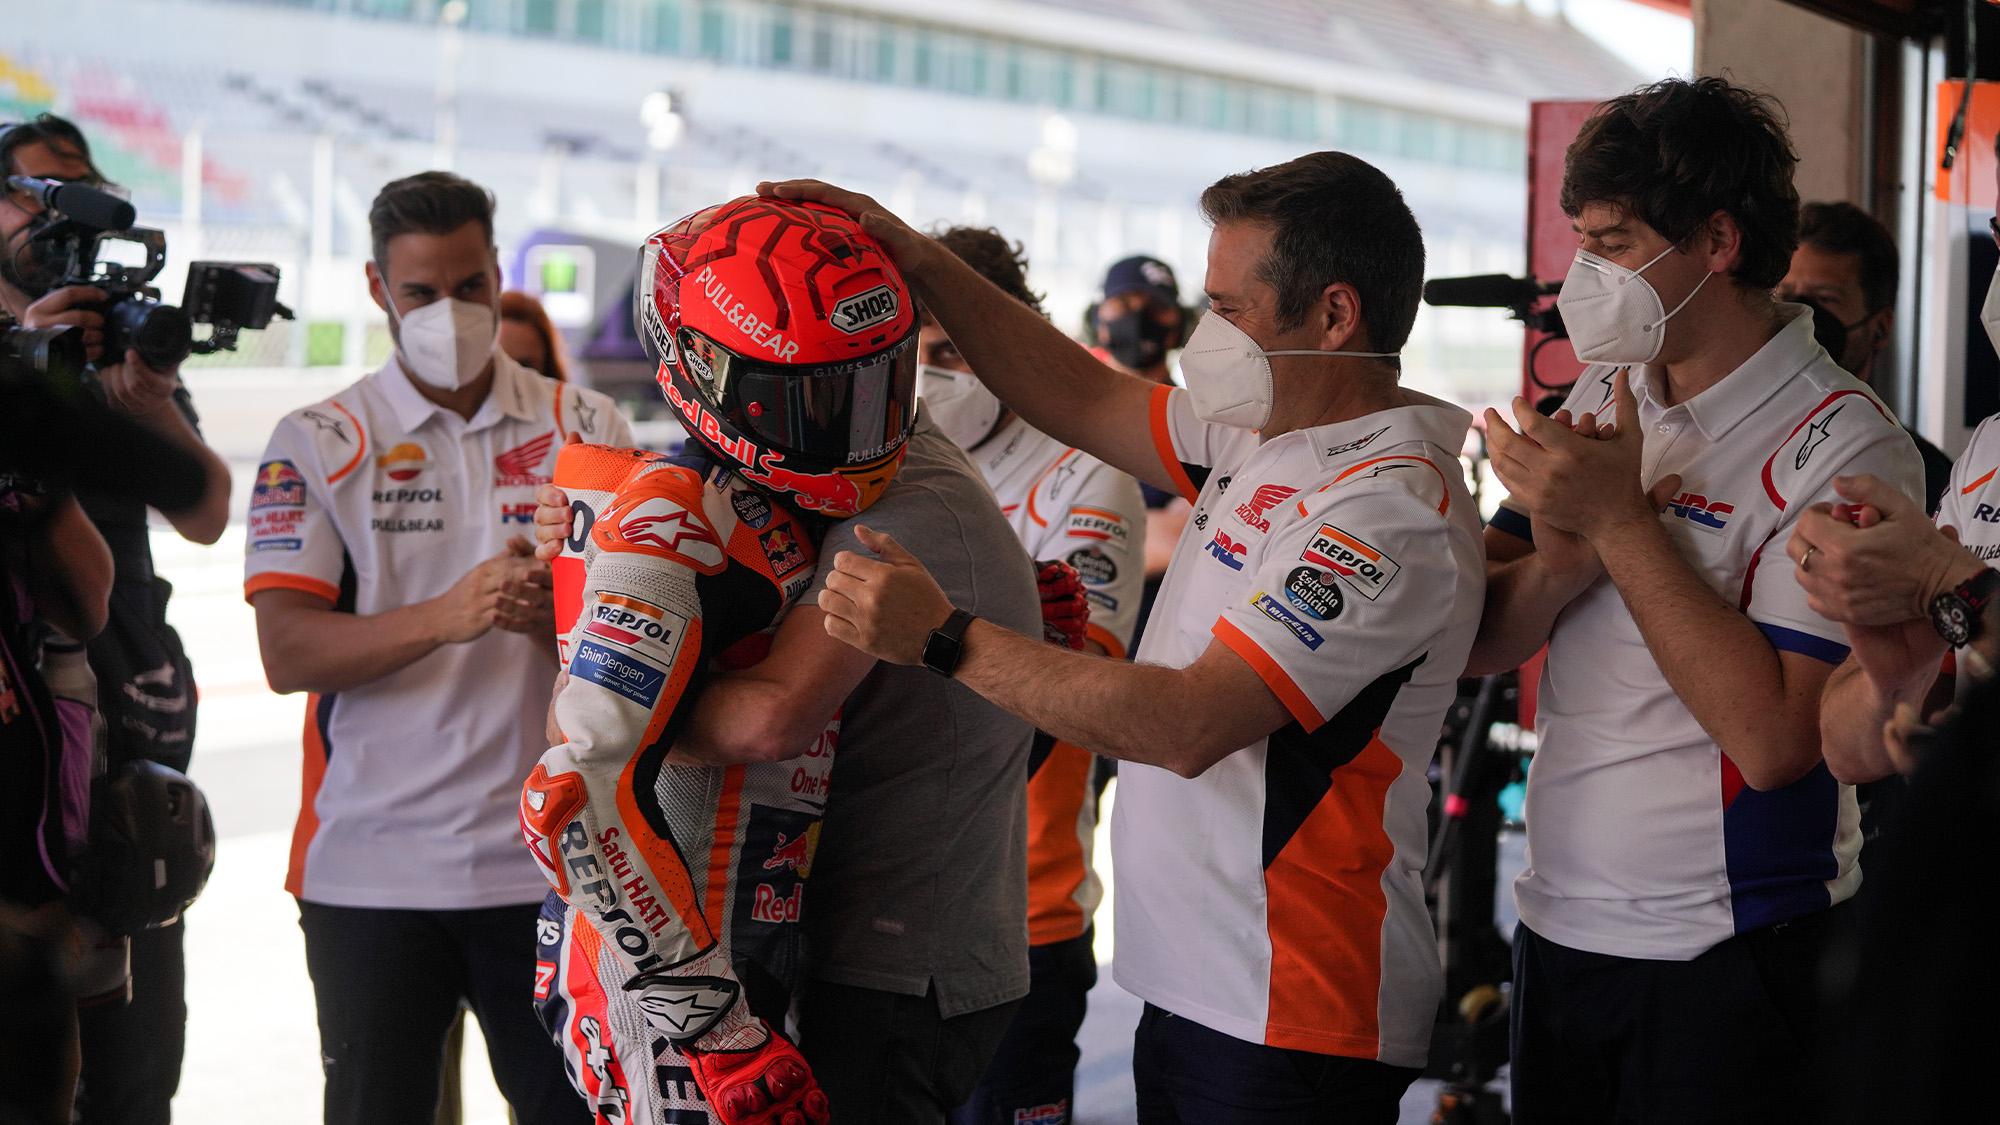 Marc Marquez congratulated by pit crew after the 2021 MotoGP Portuguese GP